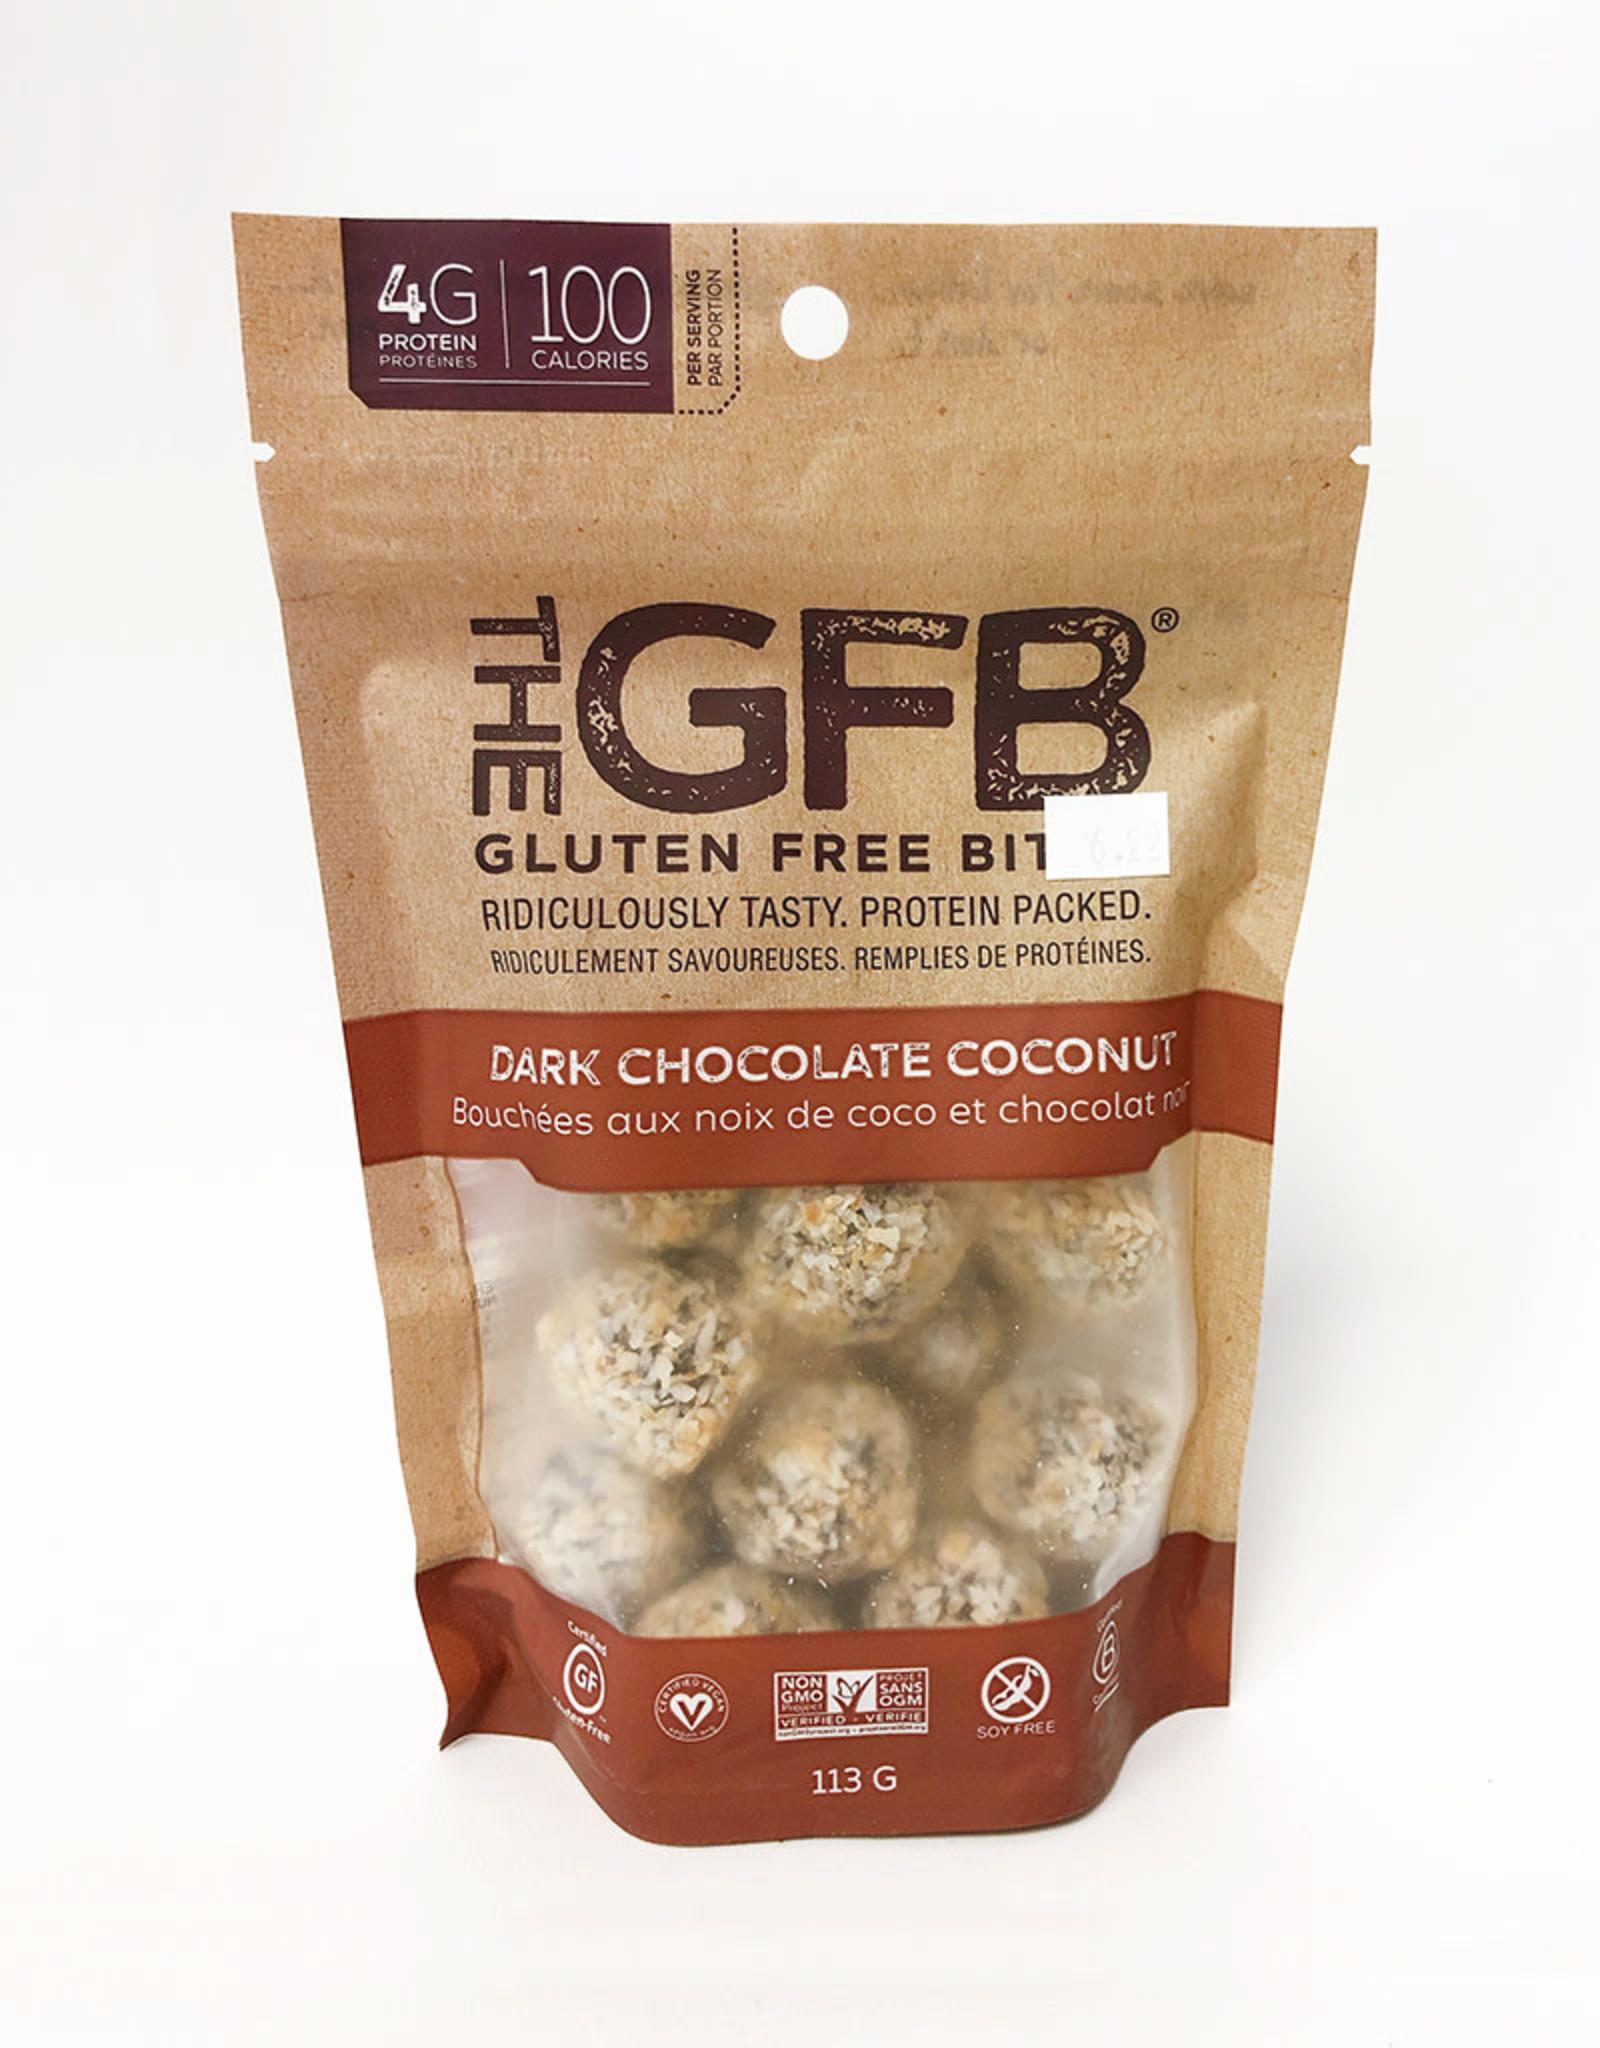 The GFB The GFB - Bites, Dark Chocolate Coconut (113g)